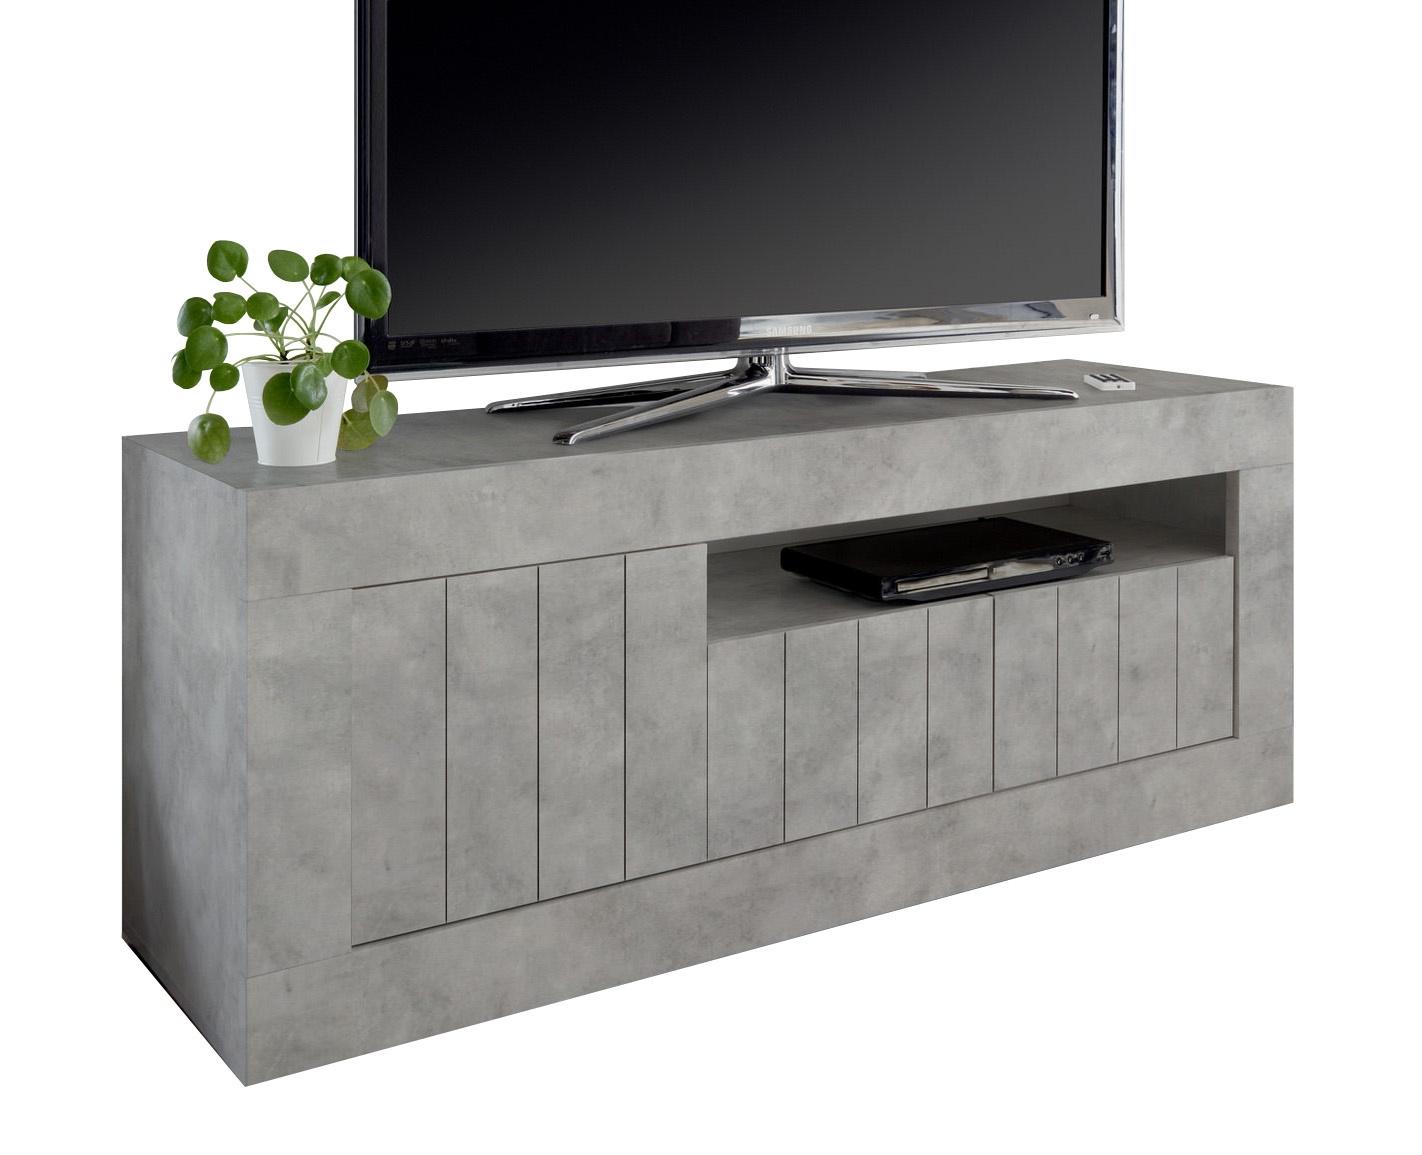 Tv-meubel Urbino 138 cm breed in grijs beton   Pesaro Mobilia